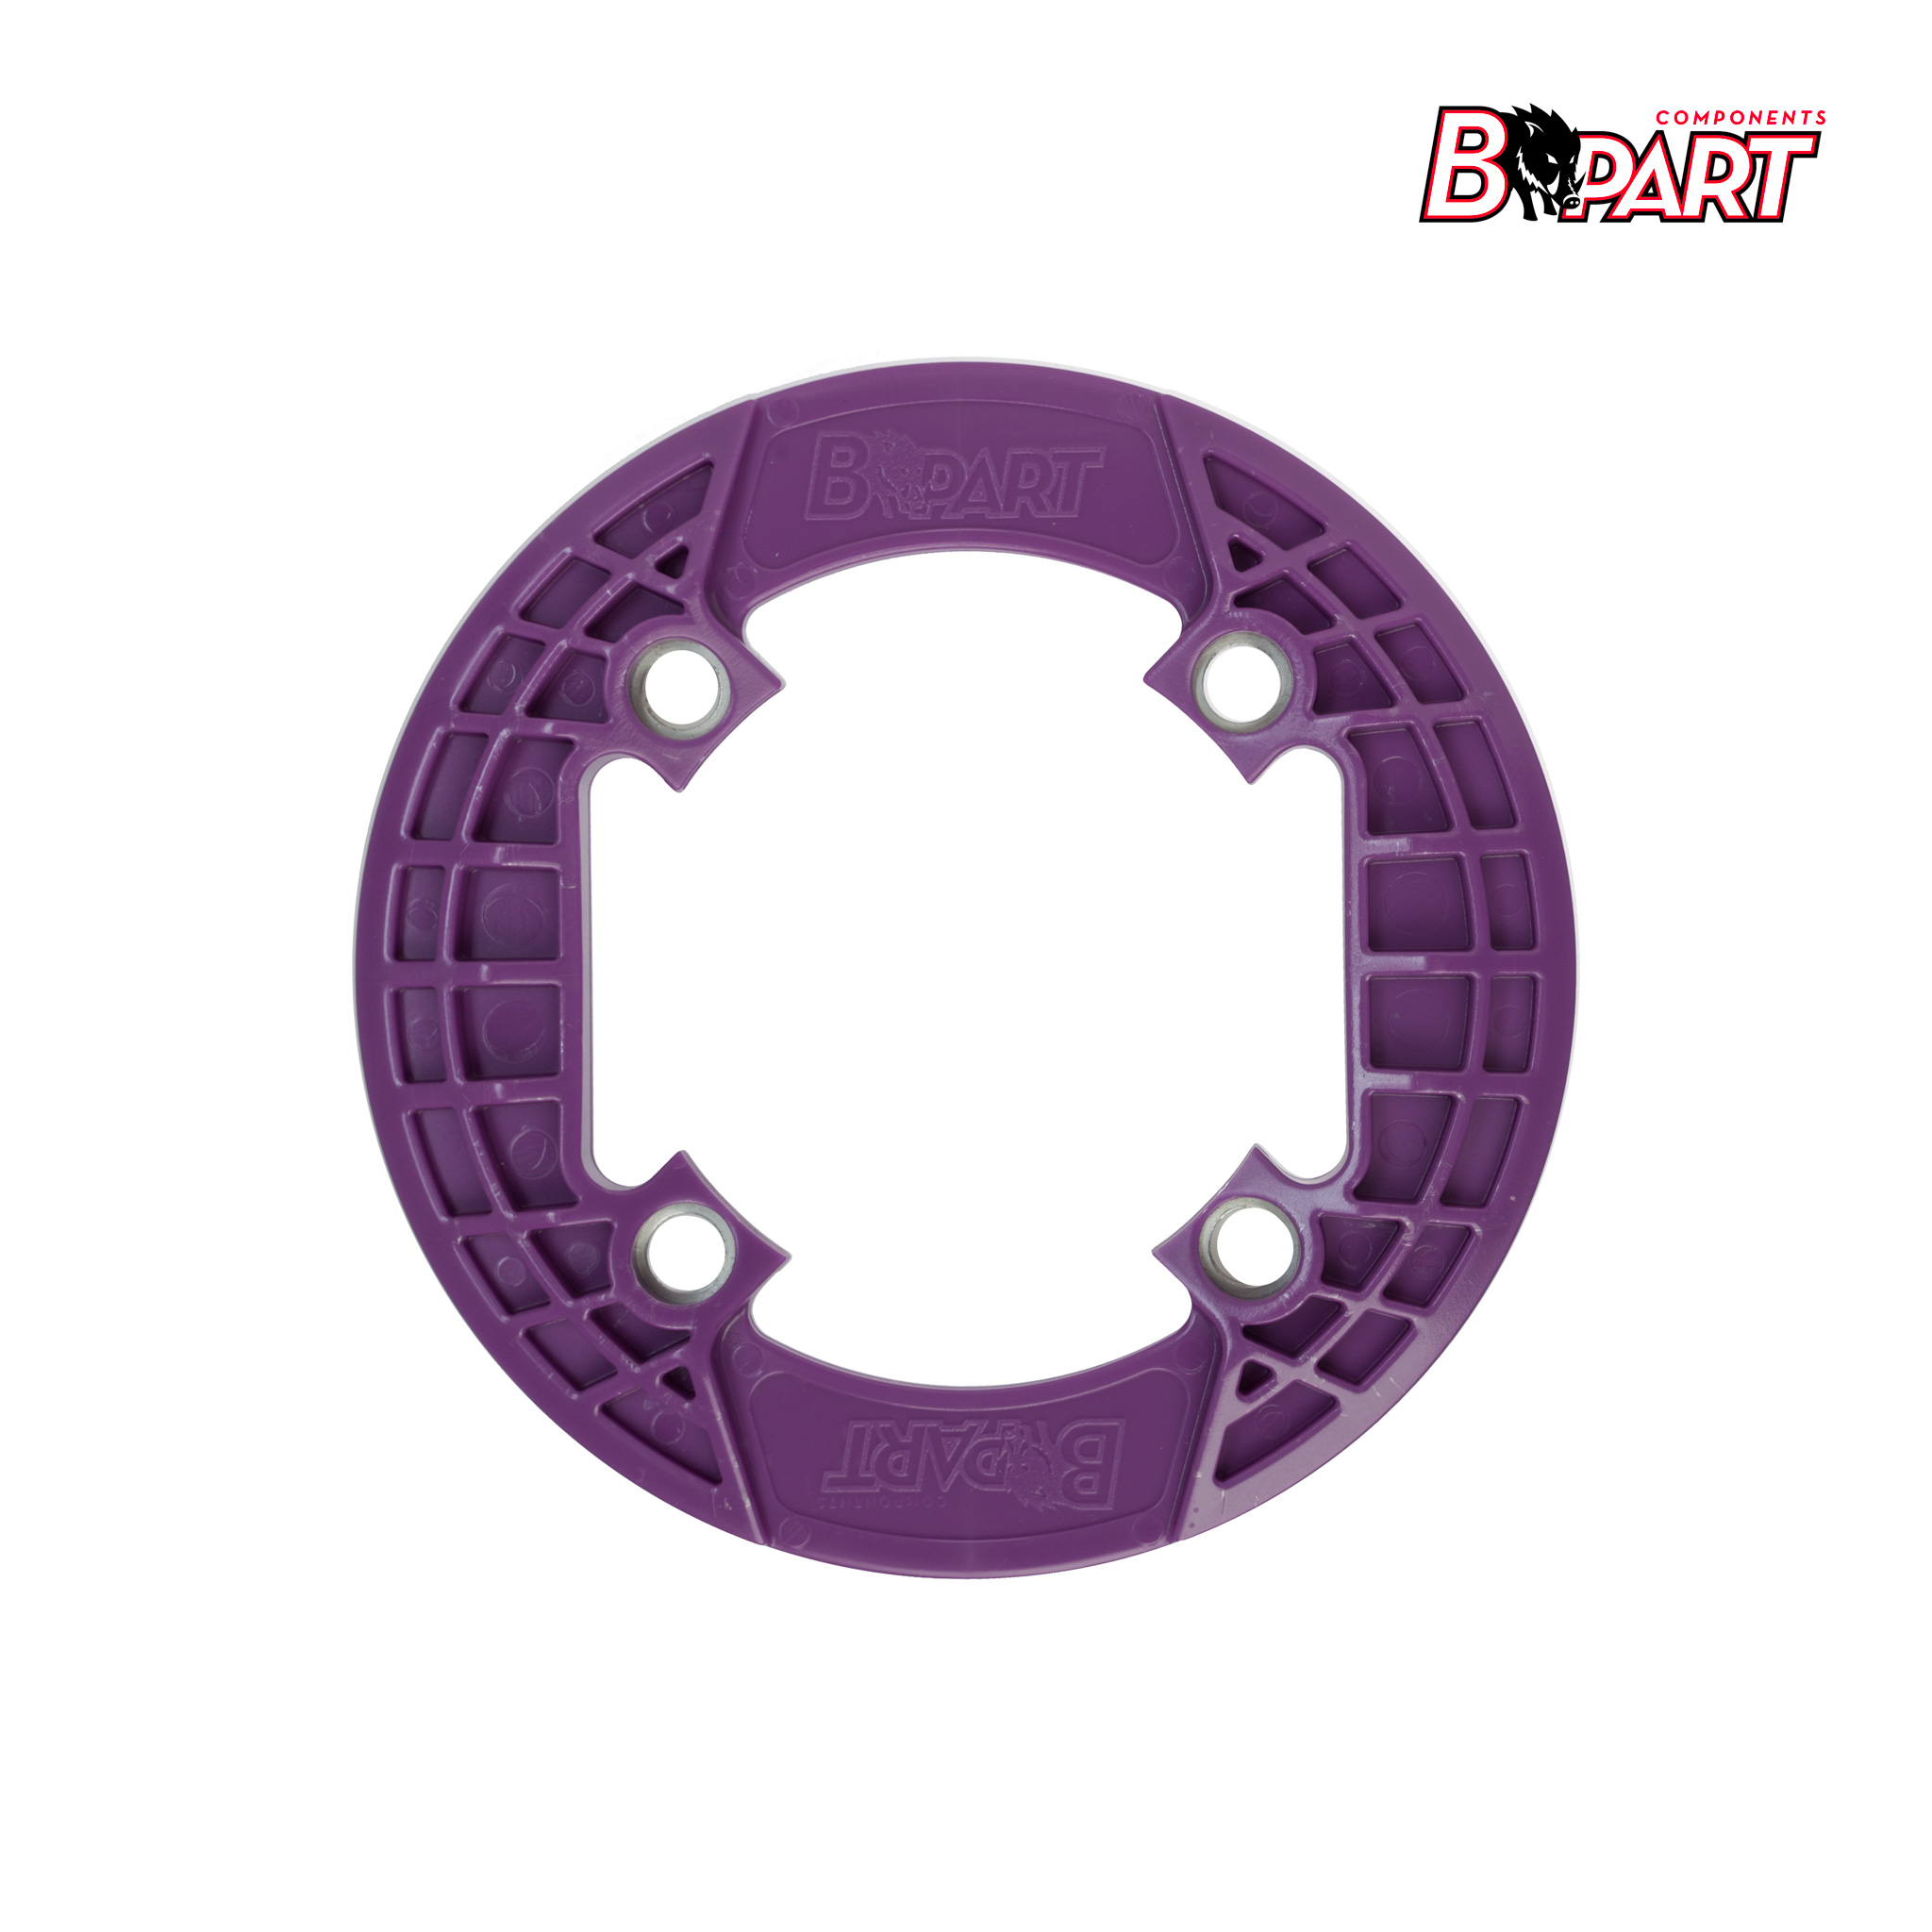 Bpart Components cubreplatos morado